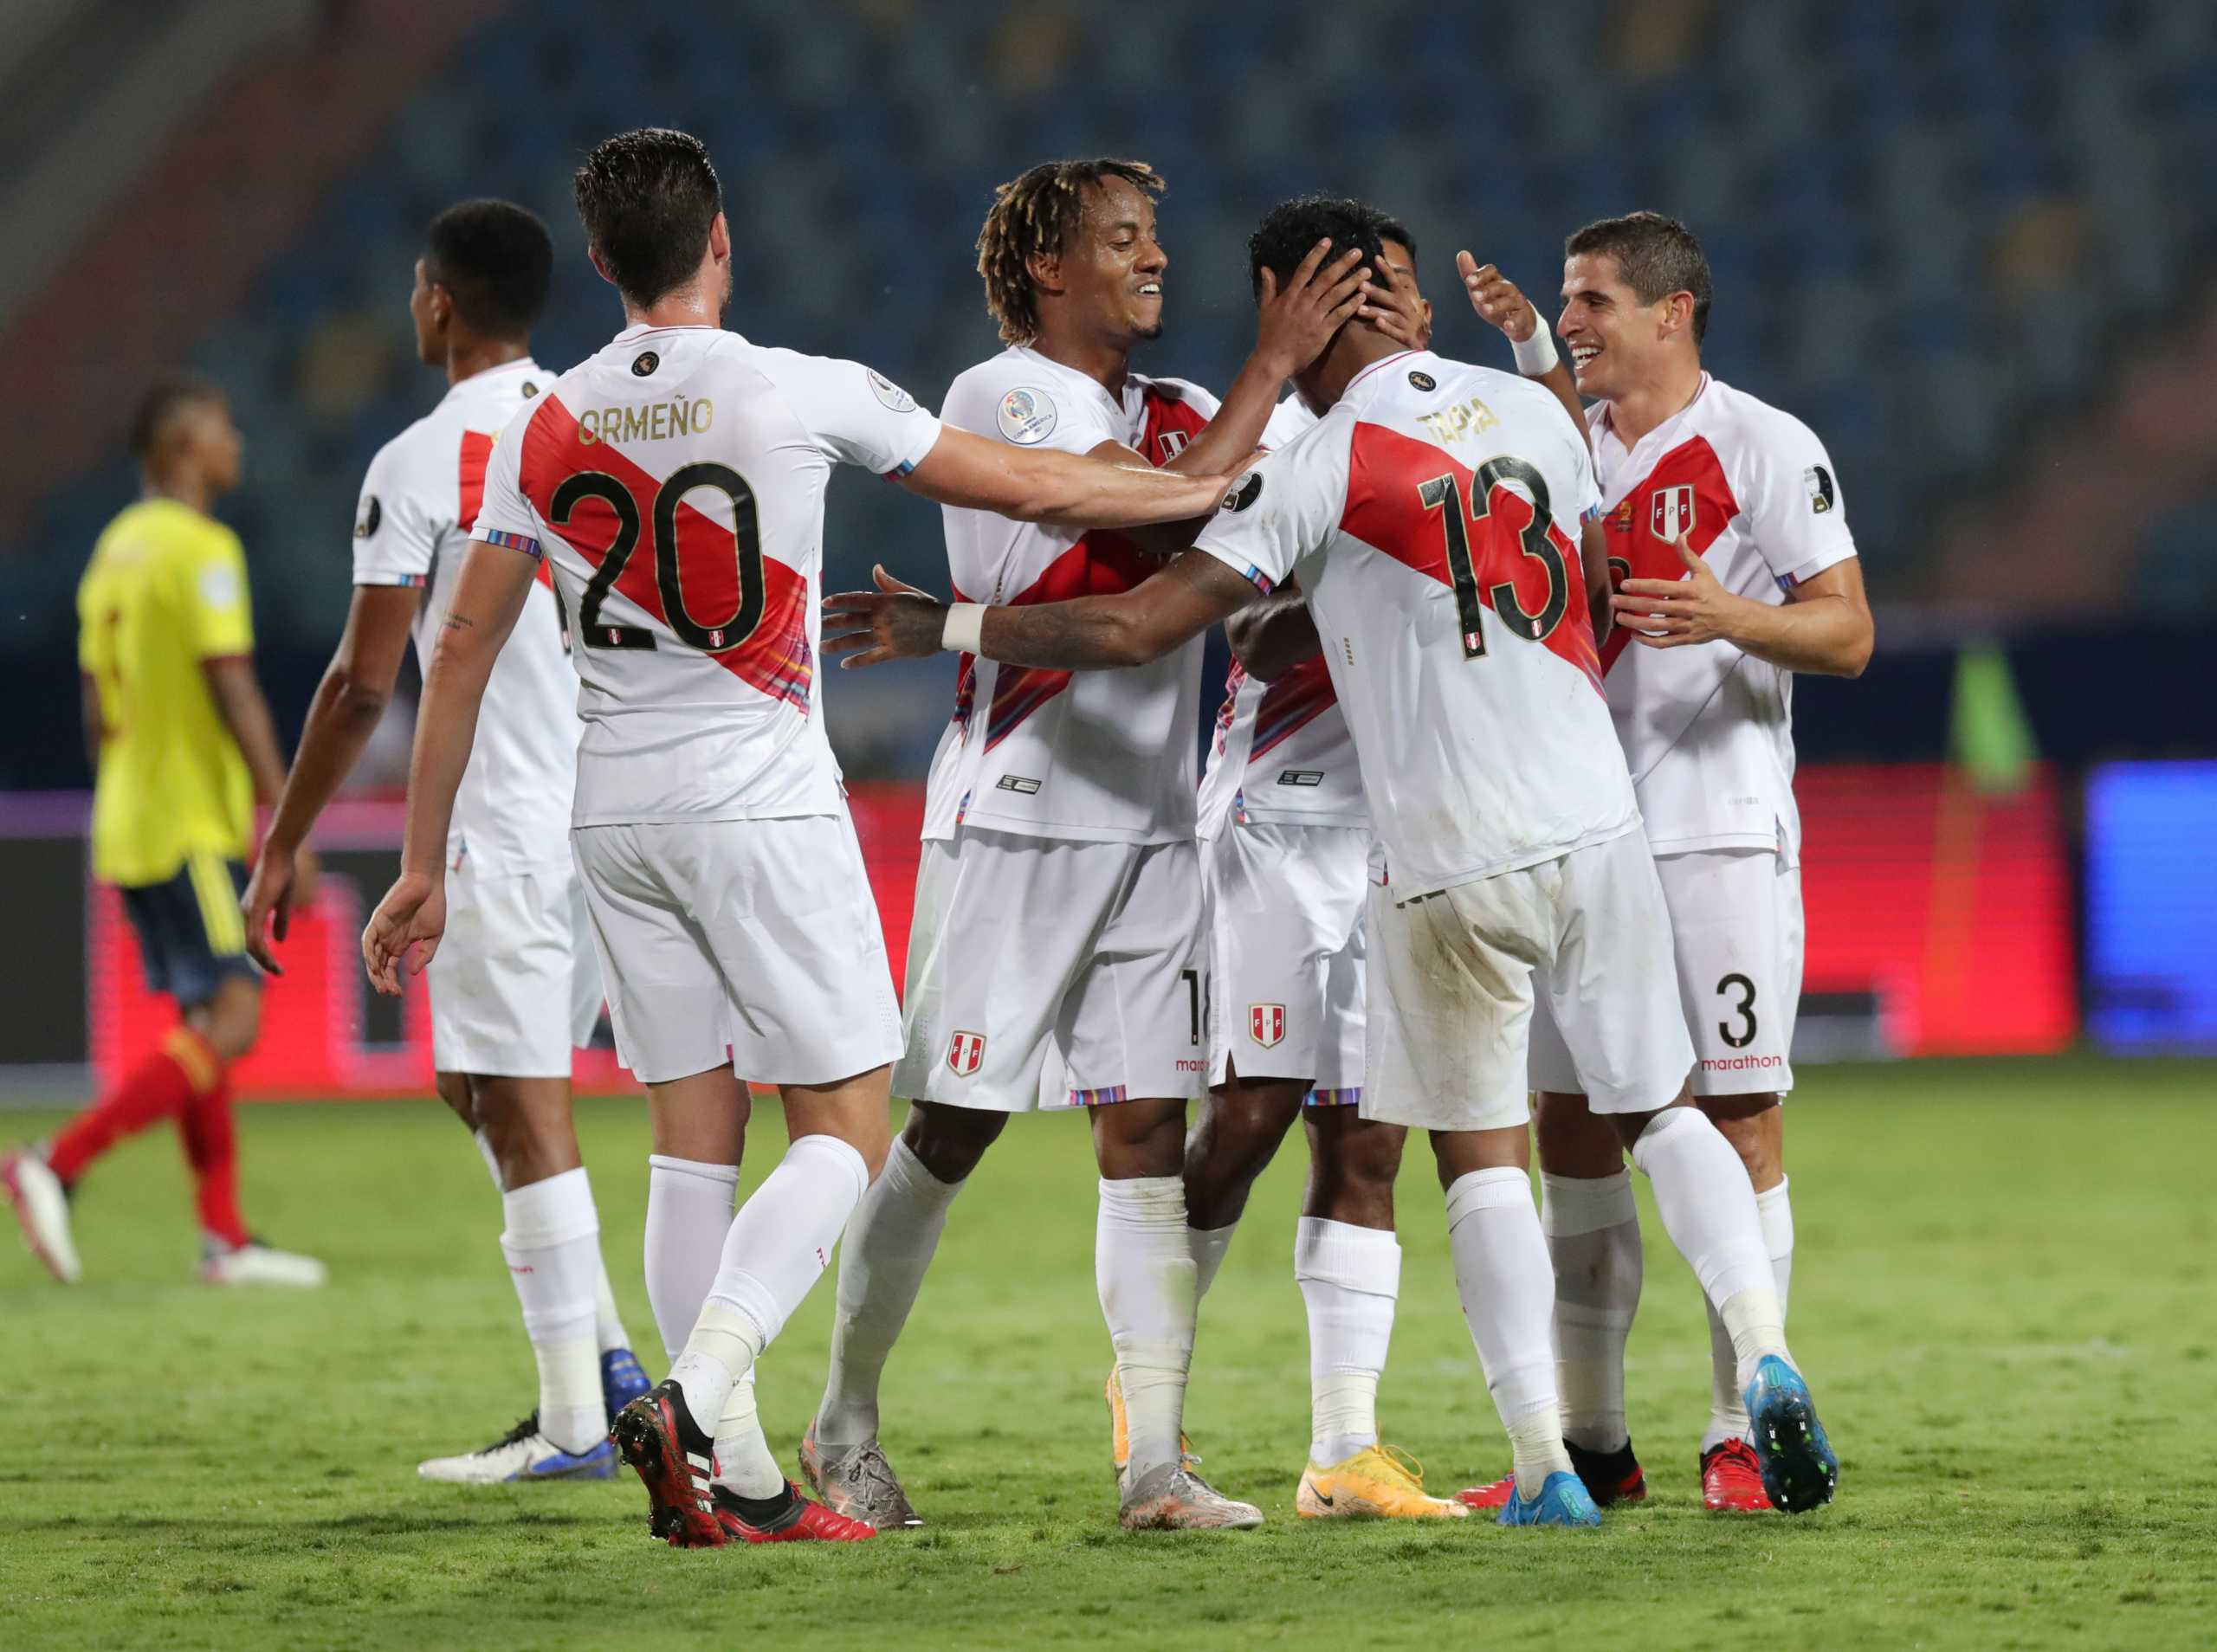 Copa America: Σπουδαία νίκη για Περού, ισόπαλες Βενεζουέλα και Εκουαδόρ